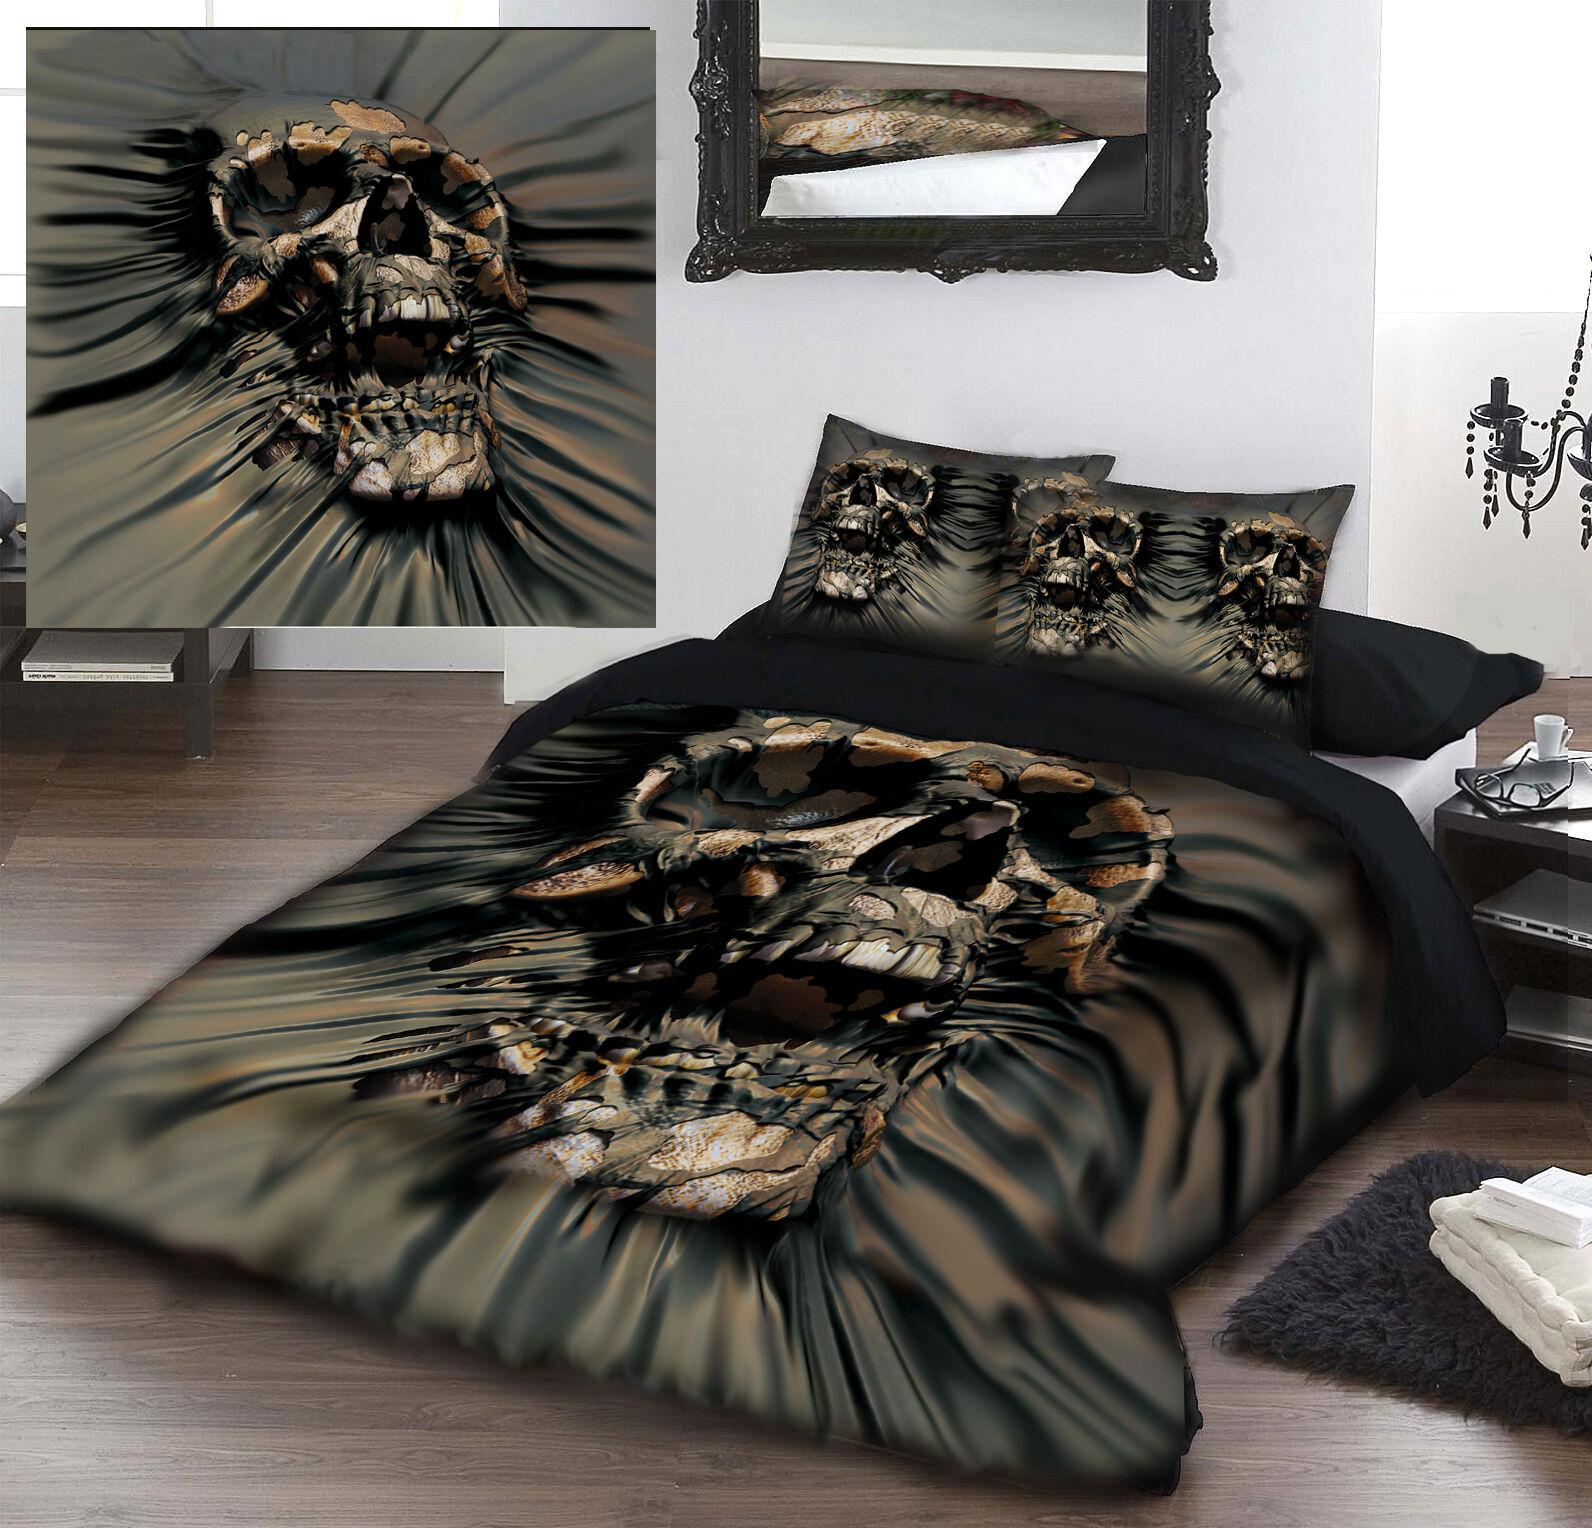 SKULL RIP-THRU - Duvet Cover Set for DOUBLE BED artwork by David Penfound